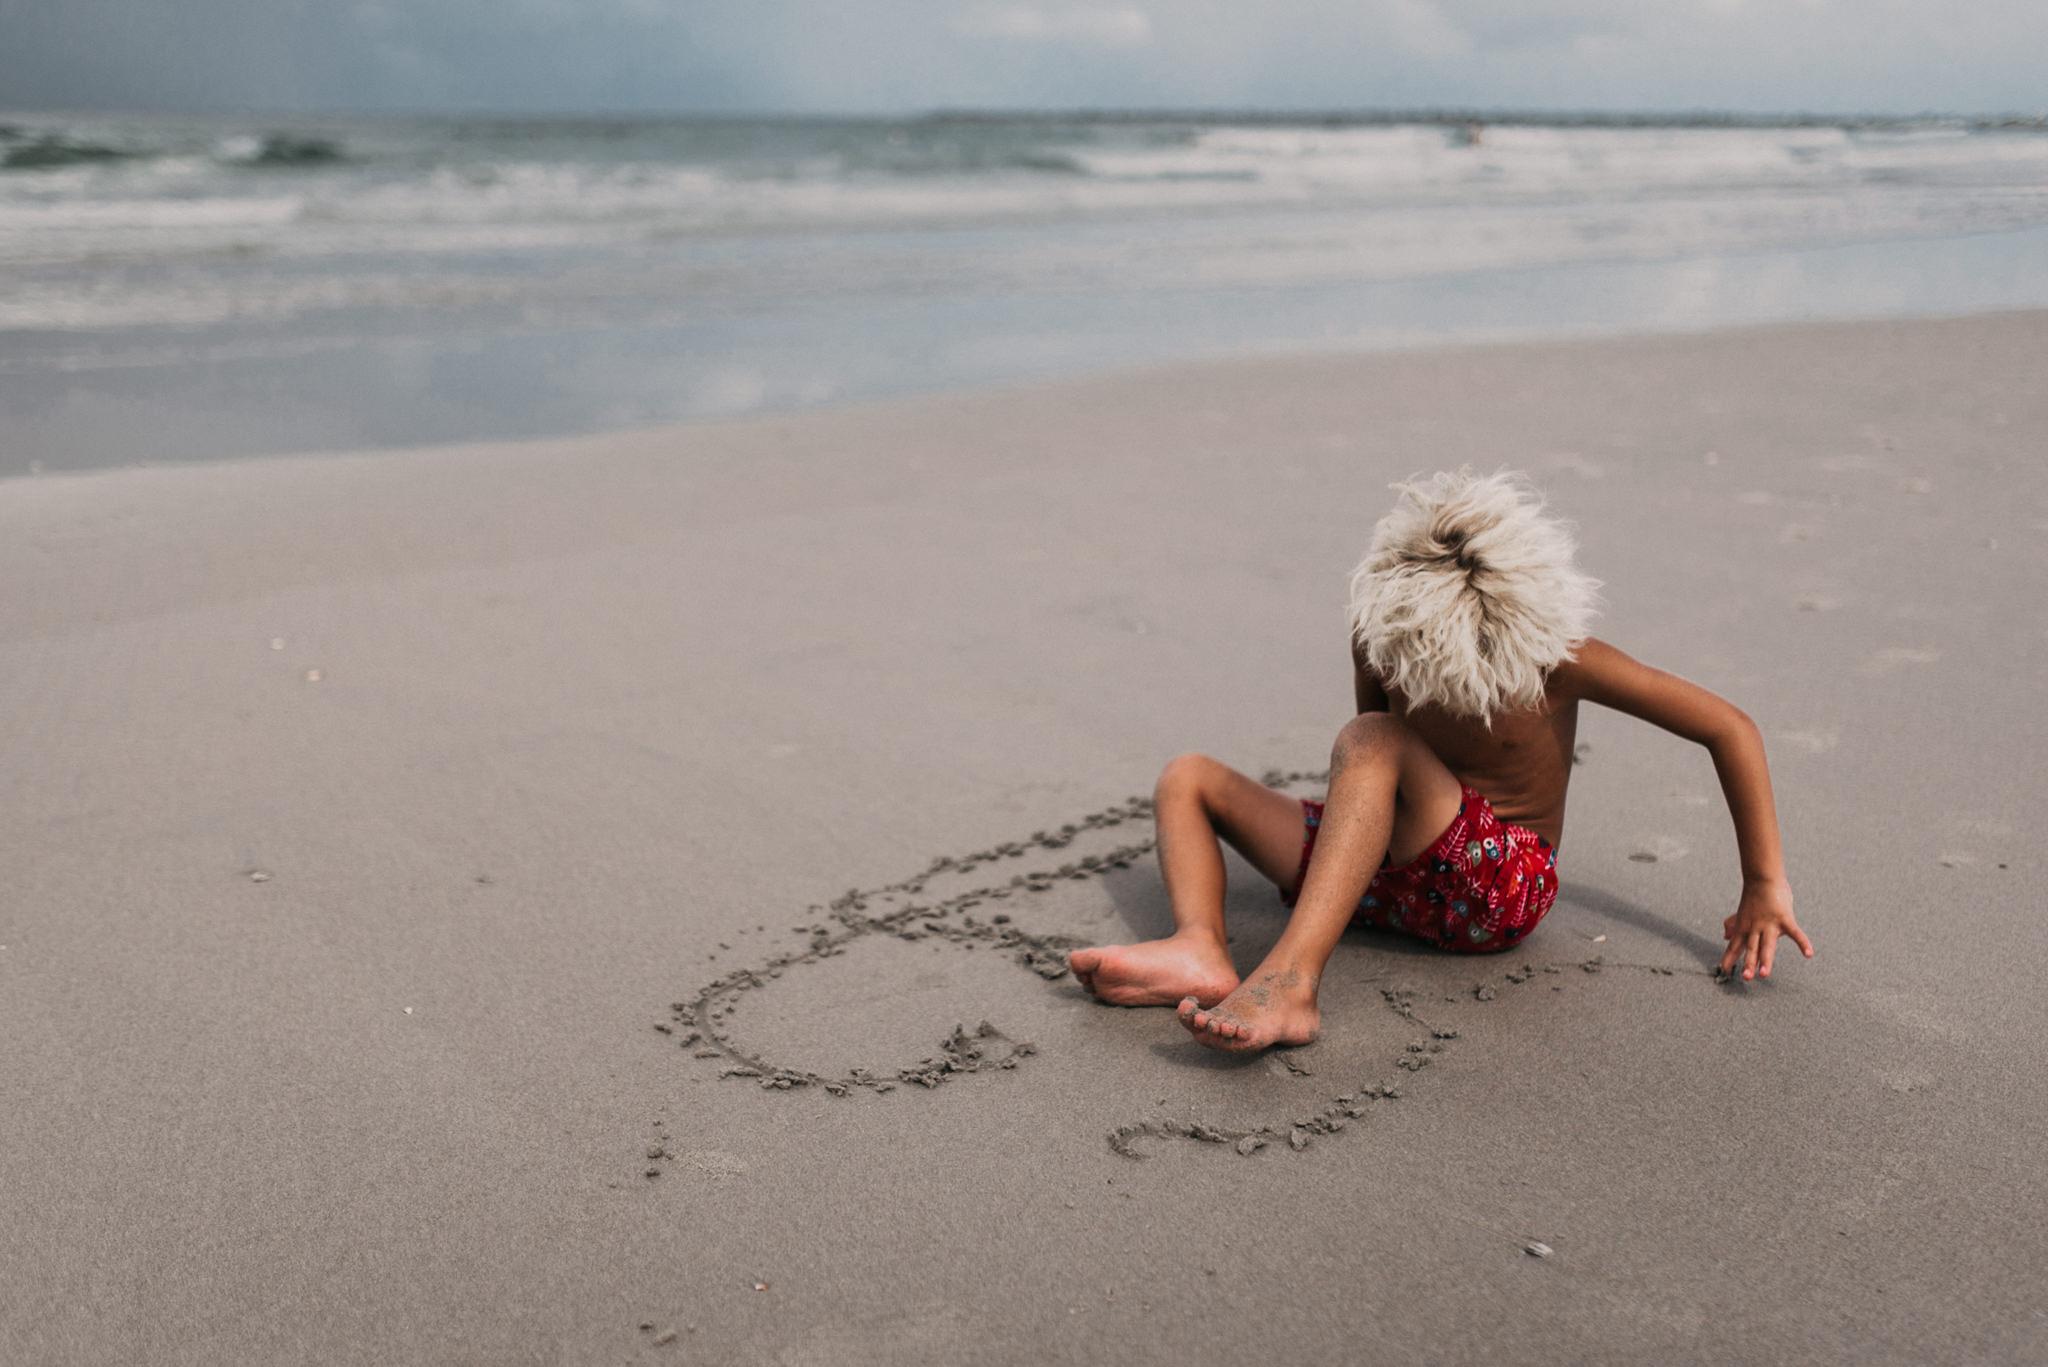 twyla jones photography - treasure coast florida - stormy beach boy playing in sand--17.jpg